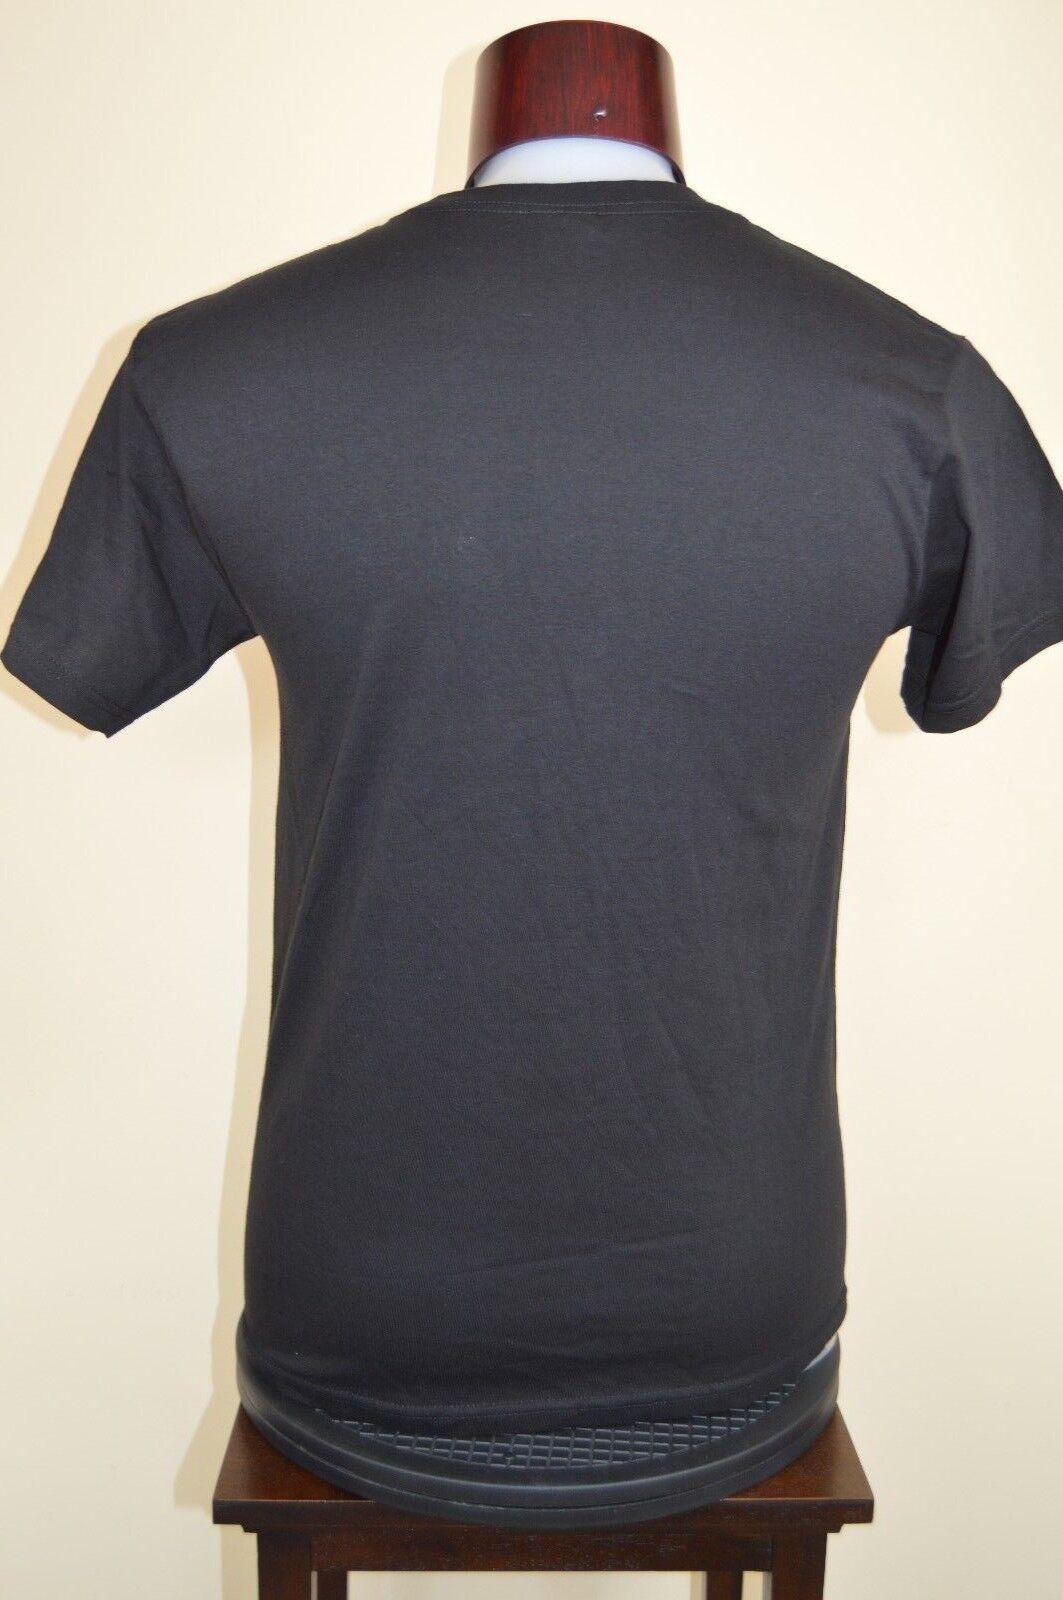 Avenged Sevenfold 2014 Mens M Black Graphic T Shirt sho